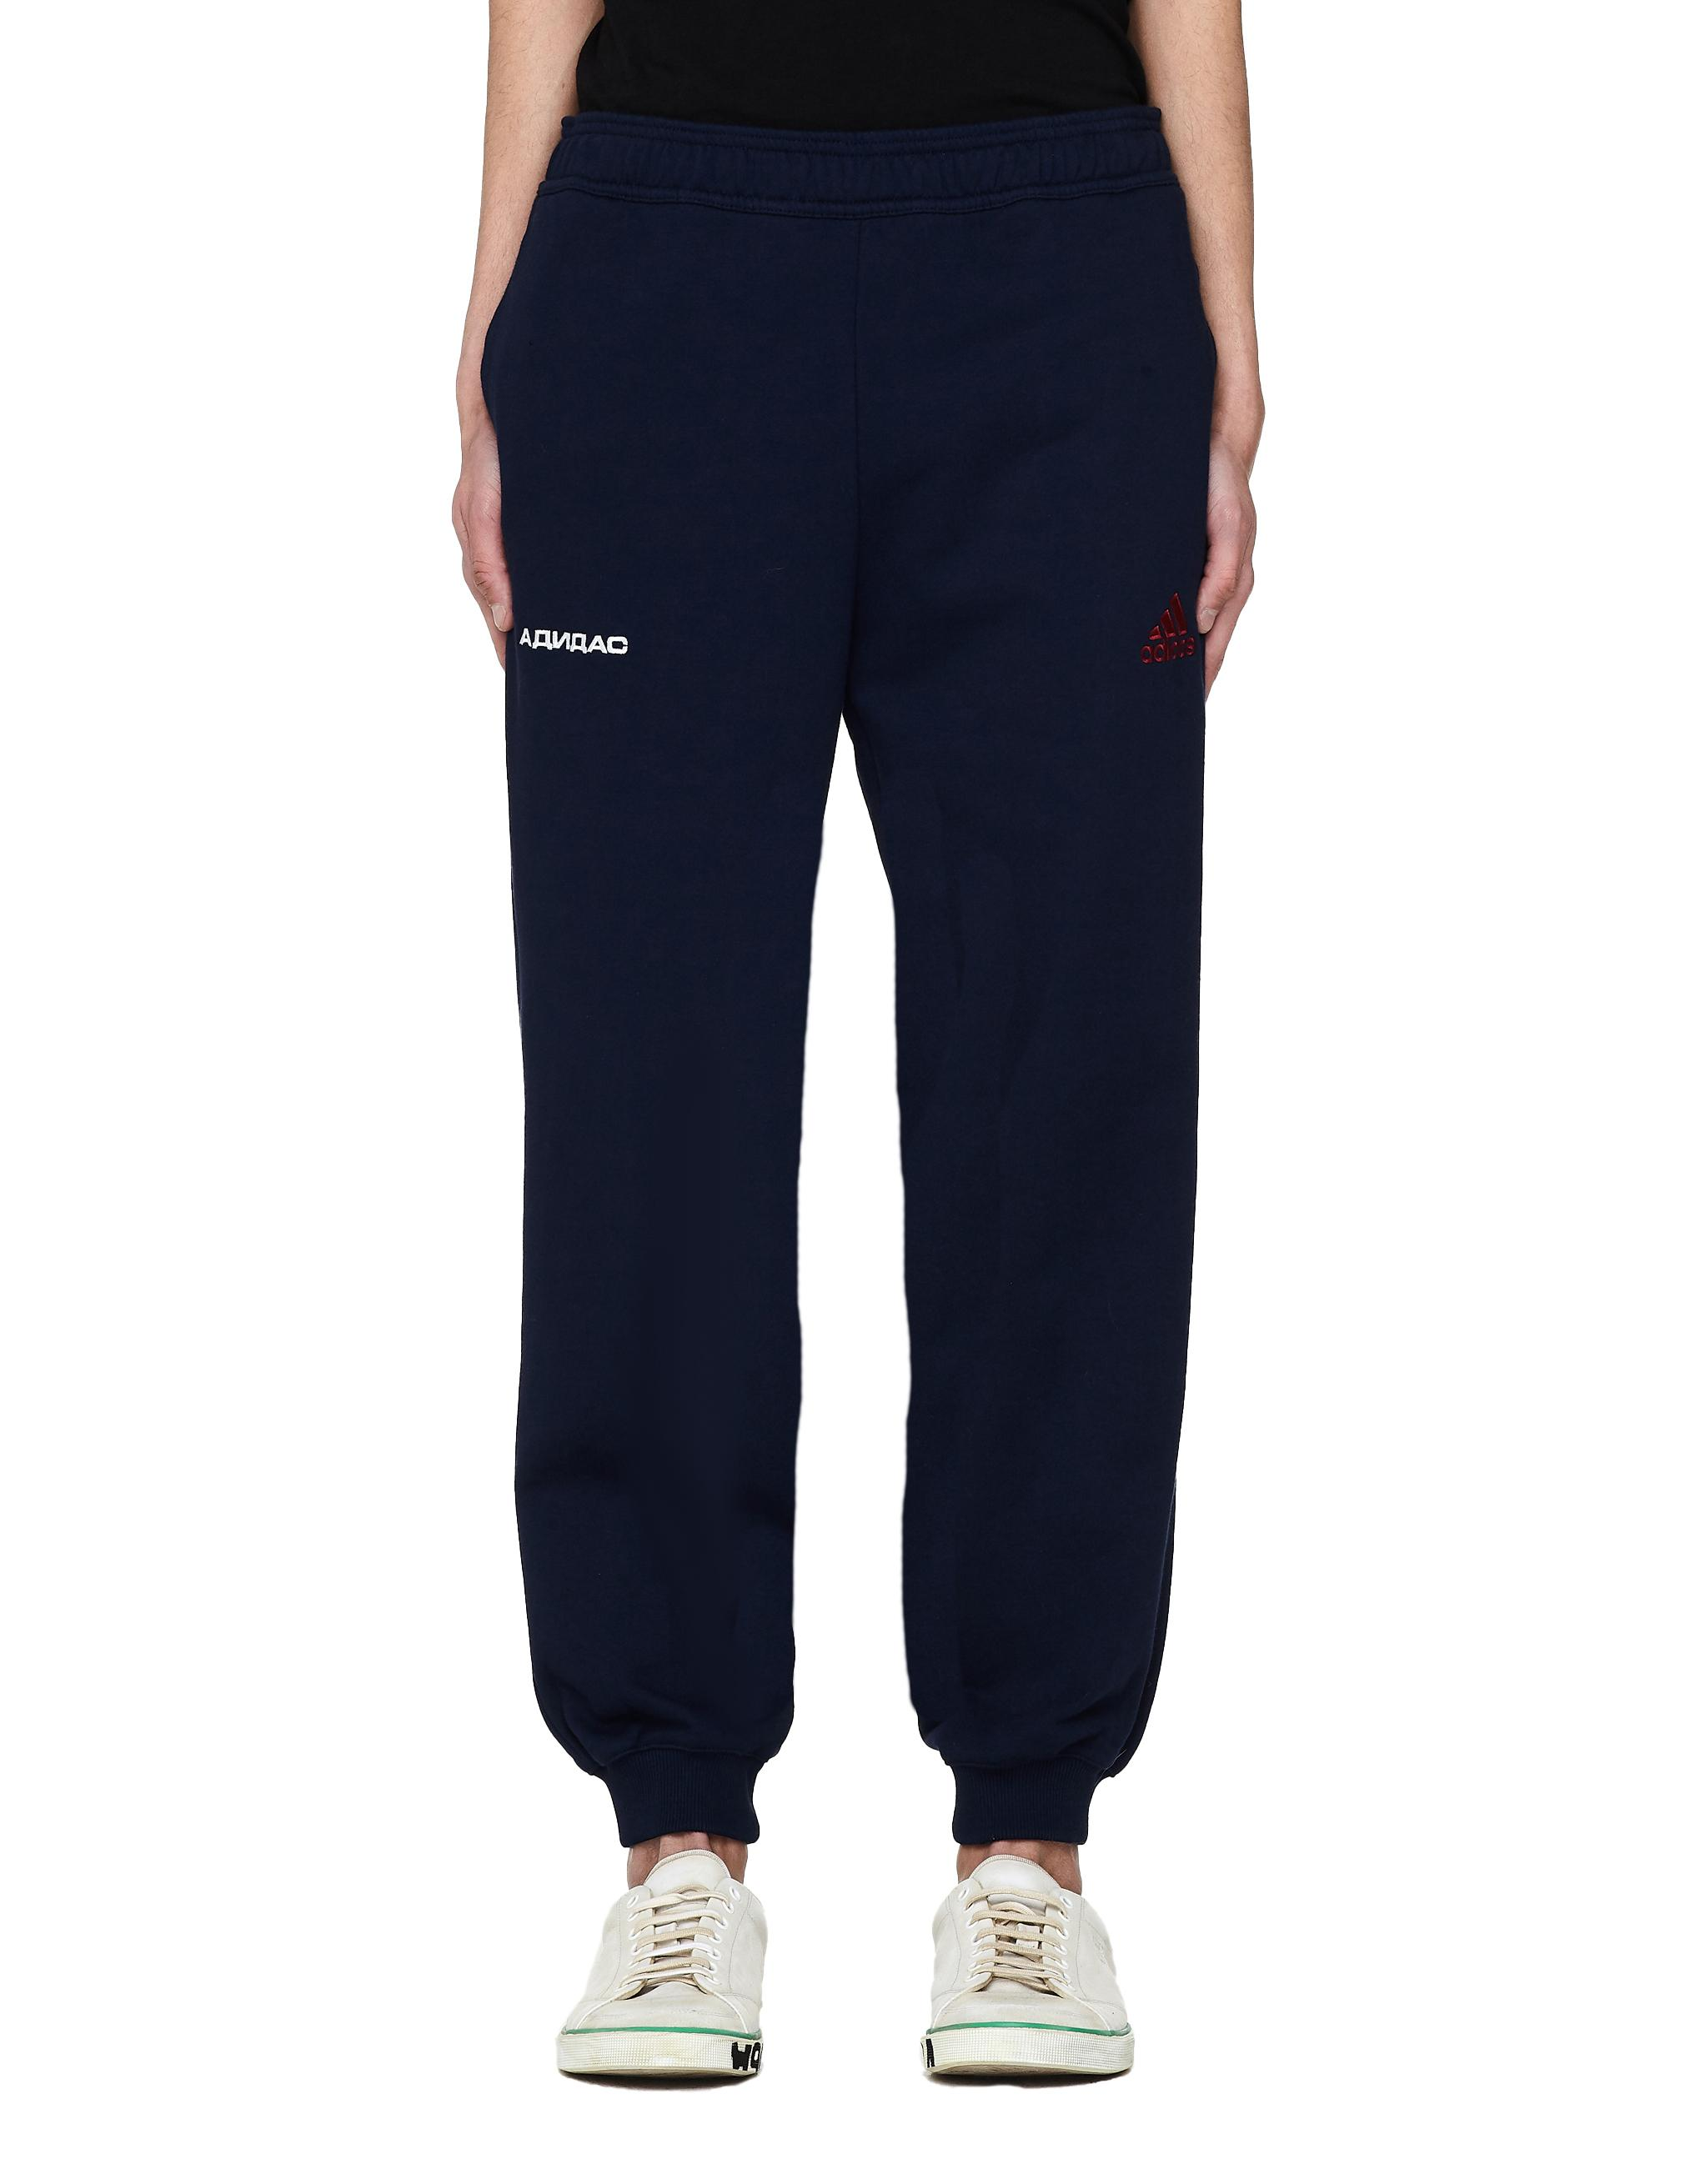 tirano arena corazón  Gosha Rubchinskiy Navy Blue Adidas Track Pants | ModeSens